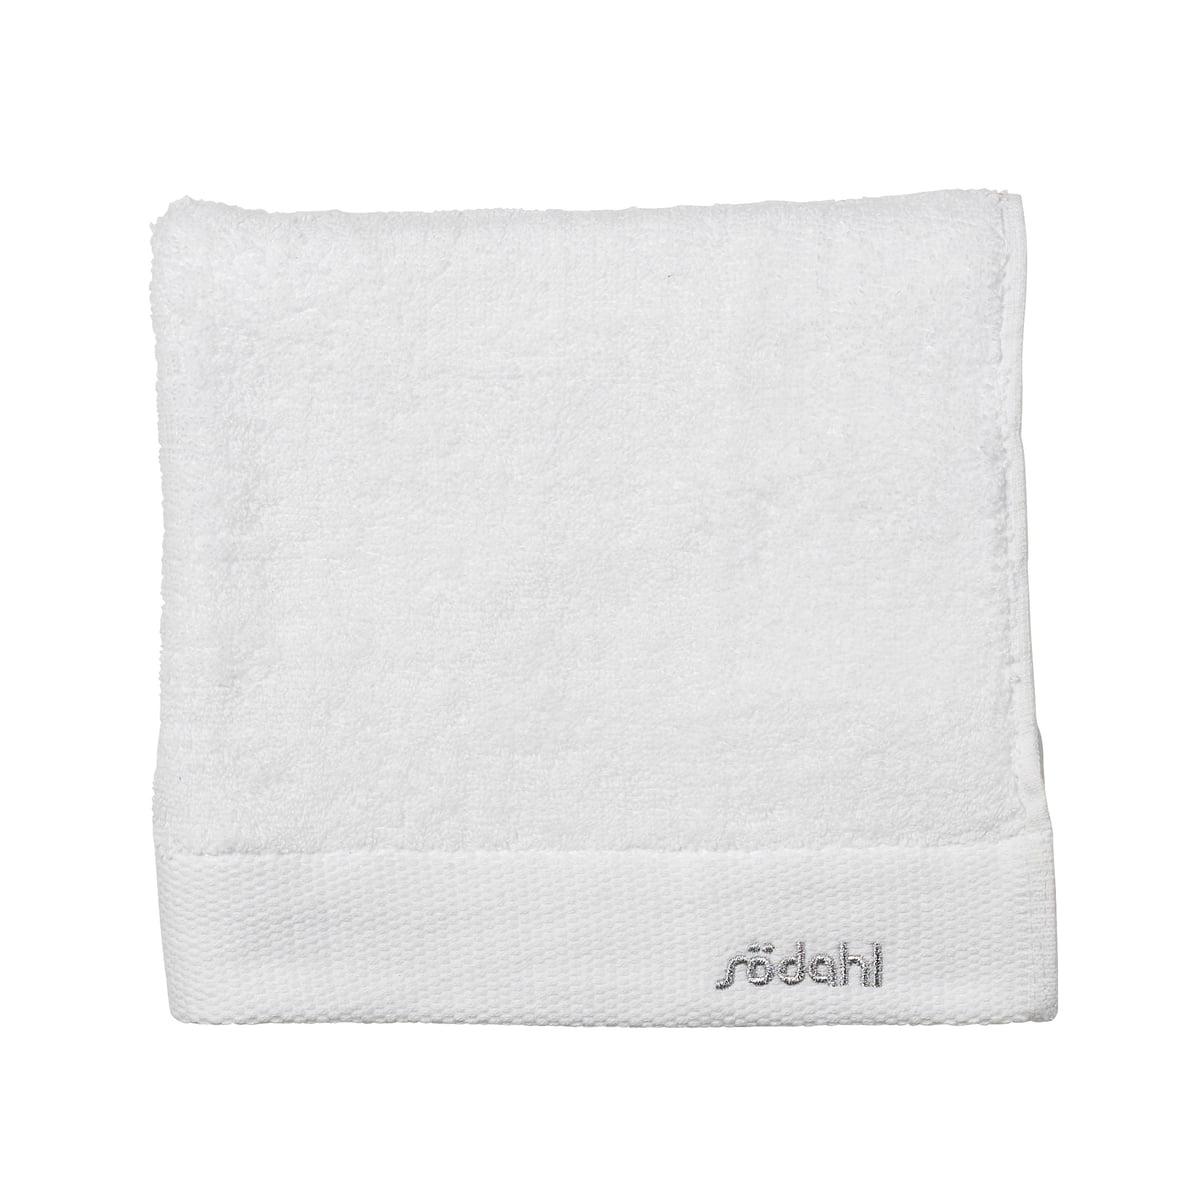 Södahl - Comfort Gästetuch 40 x 60 cm, weiß | Bad > Handtücher > Gästehandtücher | Weiß | Södahl